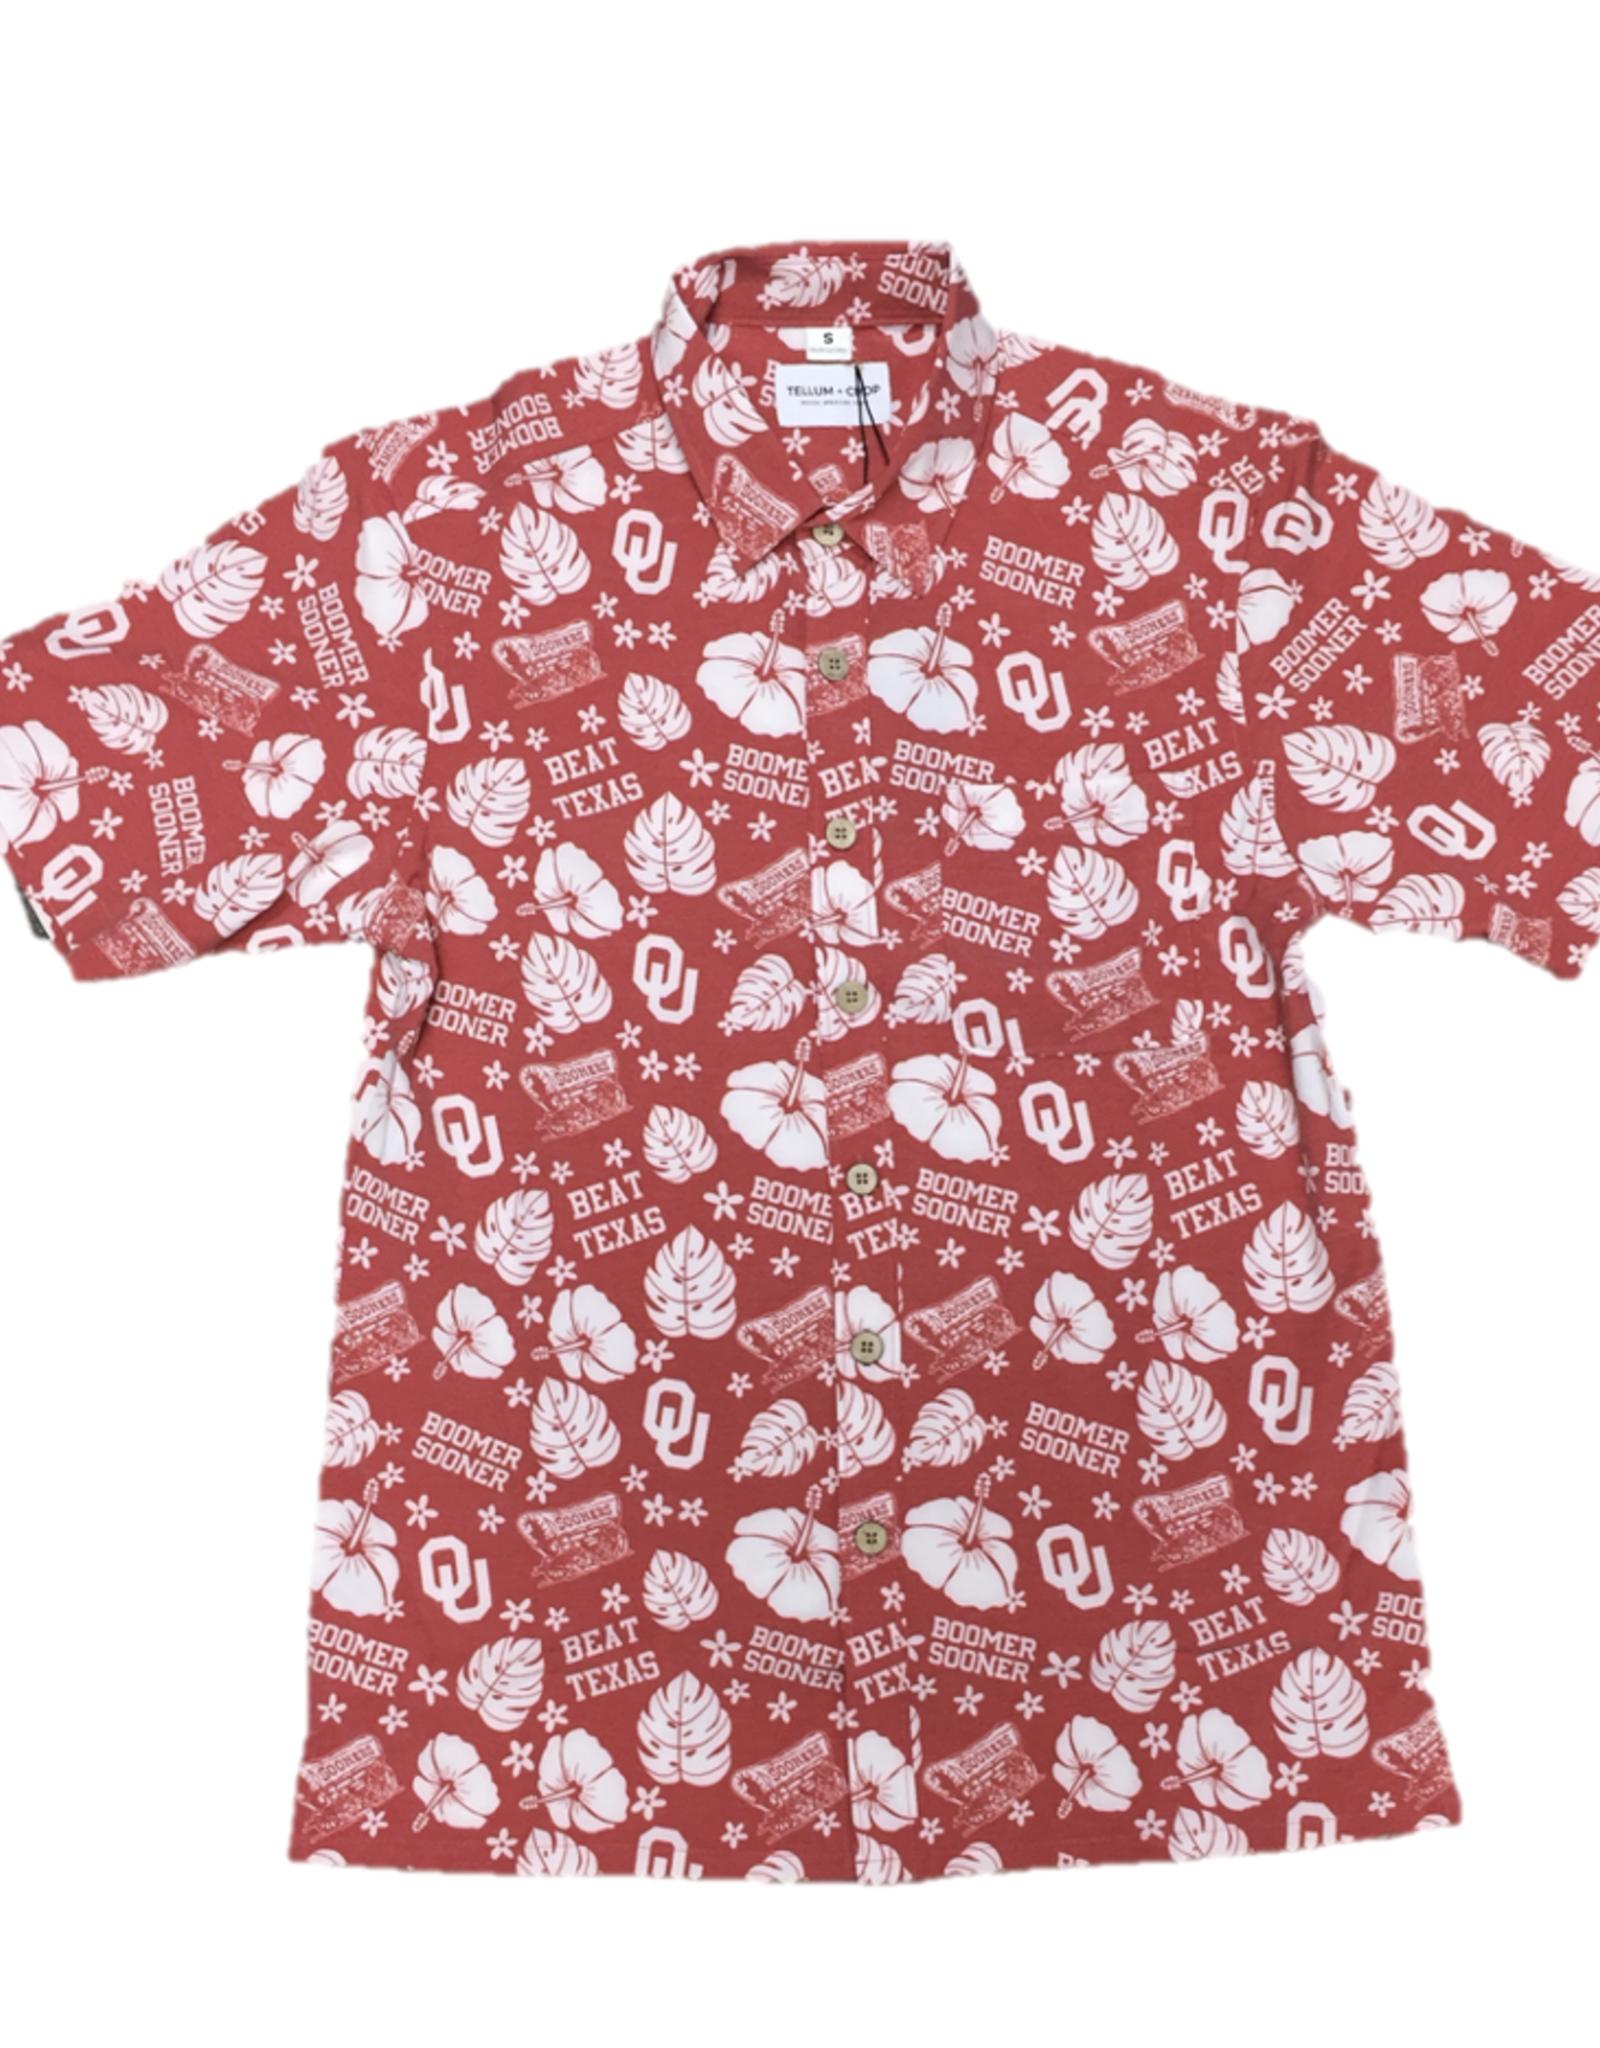 Tellum + Chop Beat Texas Hawaiian Shirt